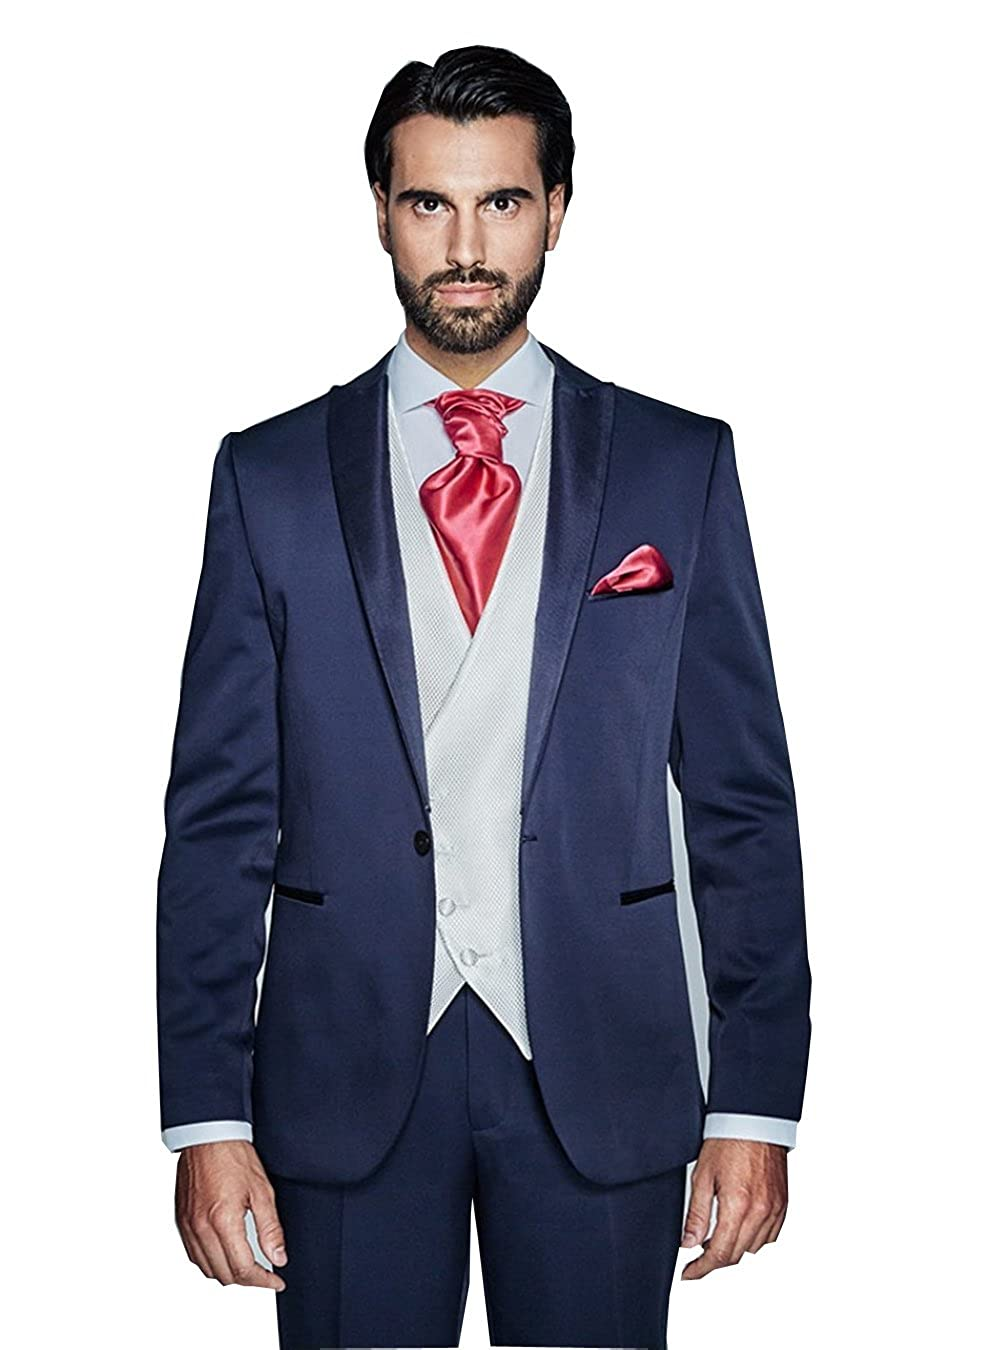 54ad58ae6f3 Fenghuavip Elegant Deep Blue 3 PCs Blazer Business Suits Set for Mens at  Amazon Men's Clothing store: